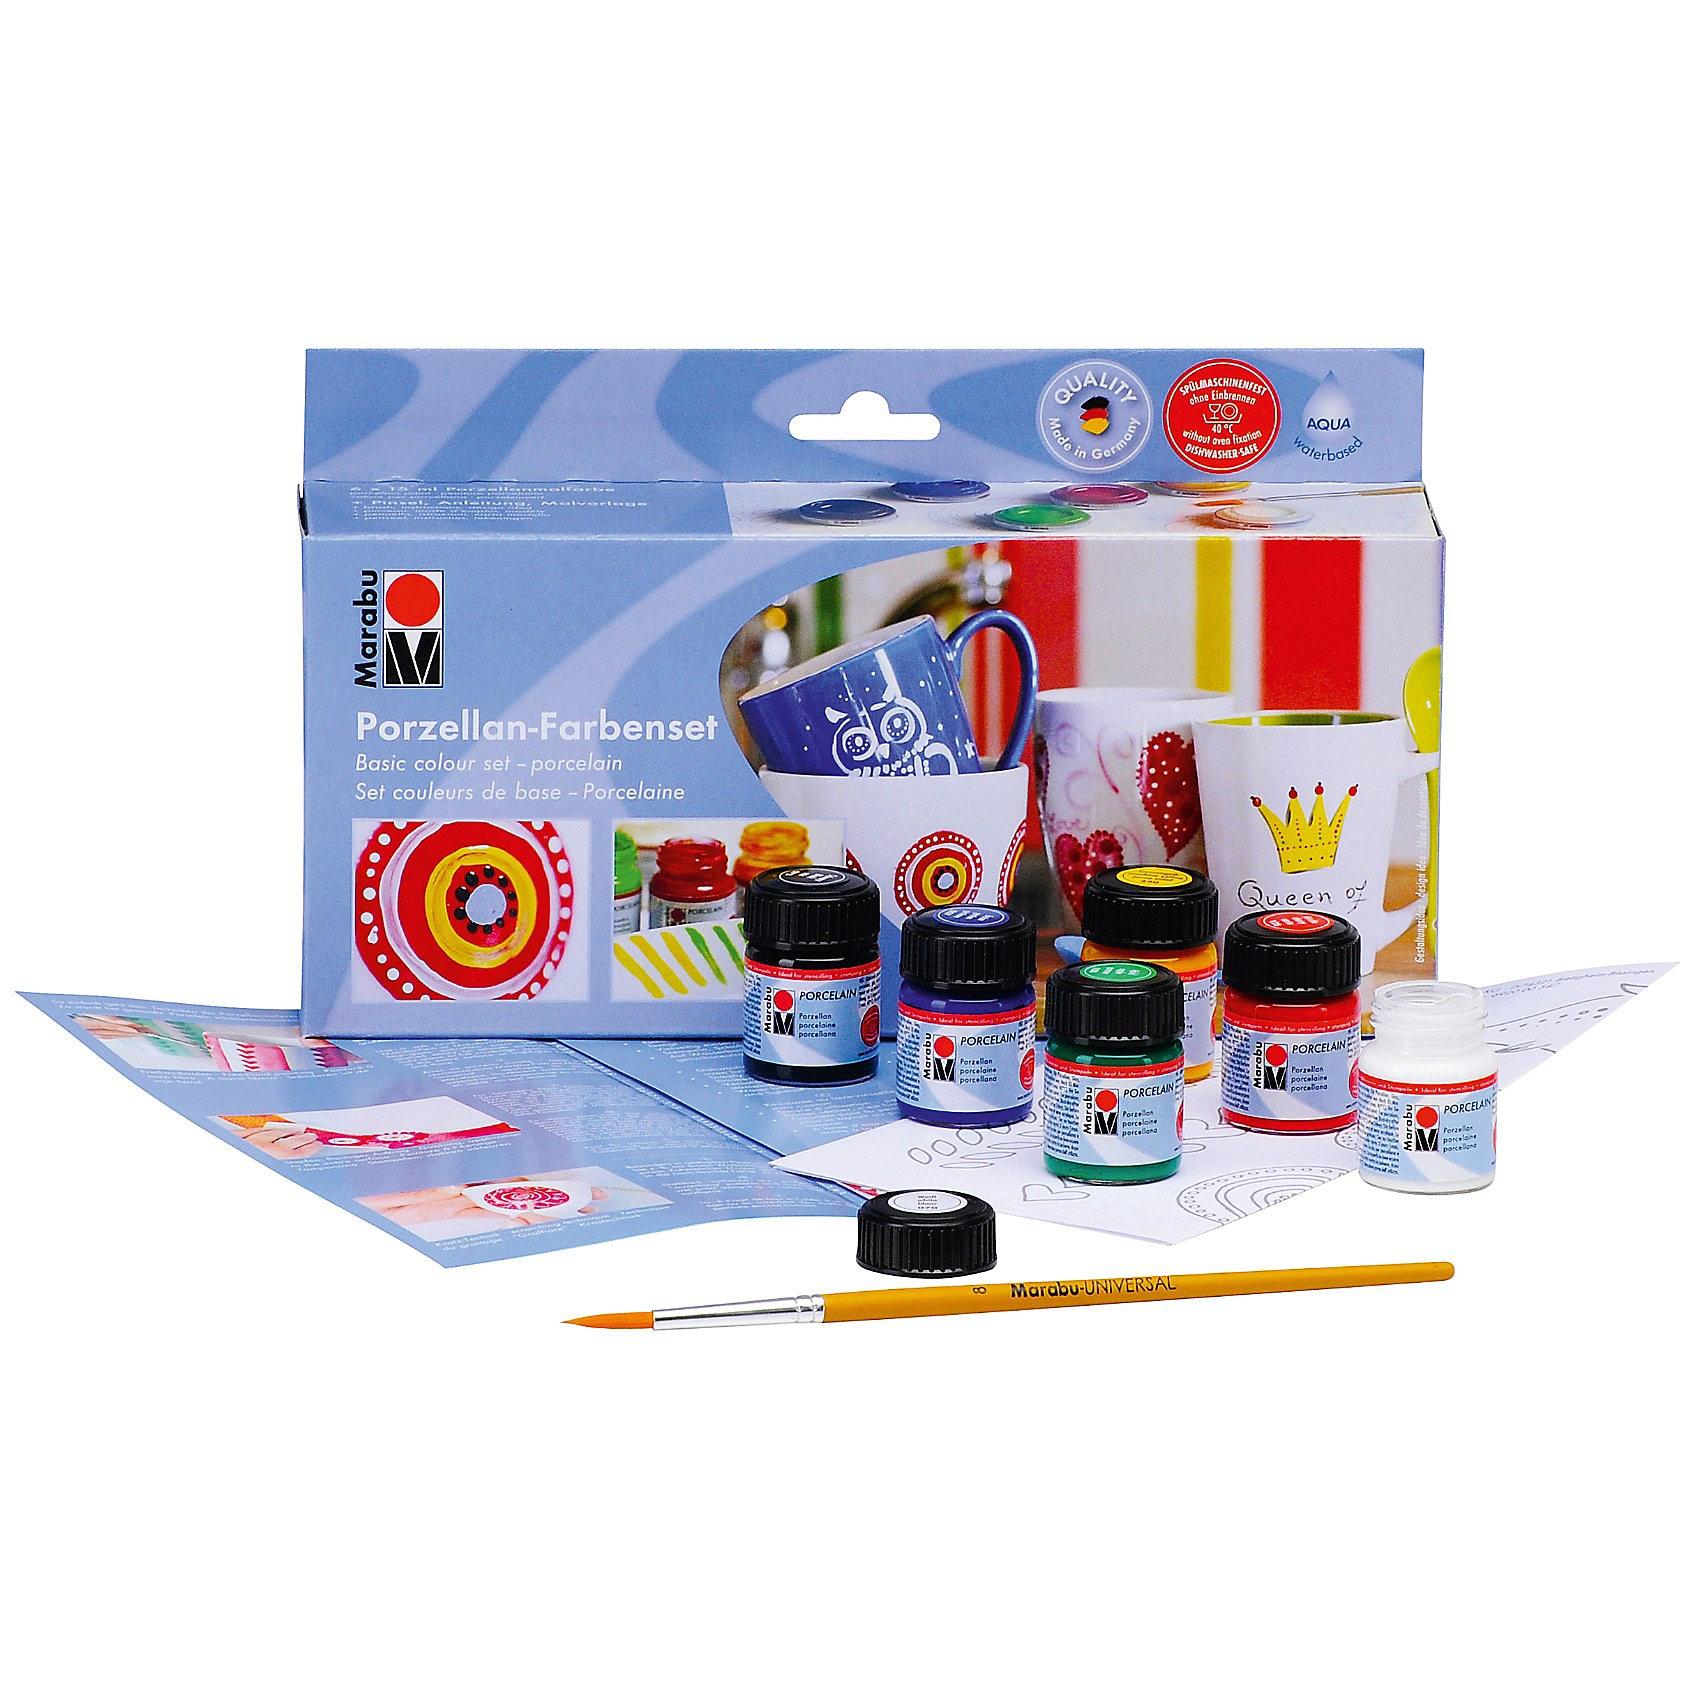 Marabu Starterset Porzellanfarbe 6 x 15 ml Pinsel